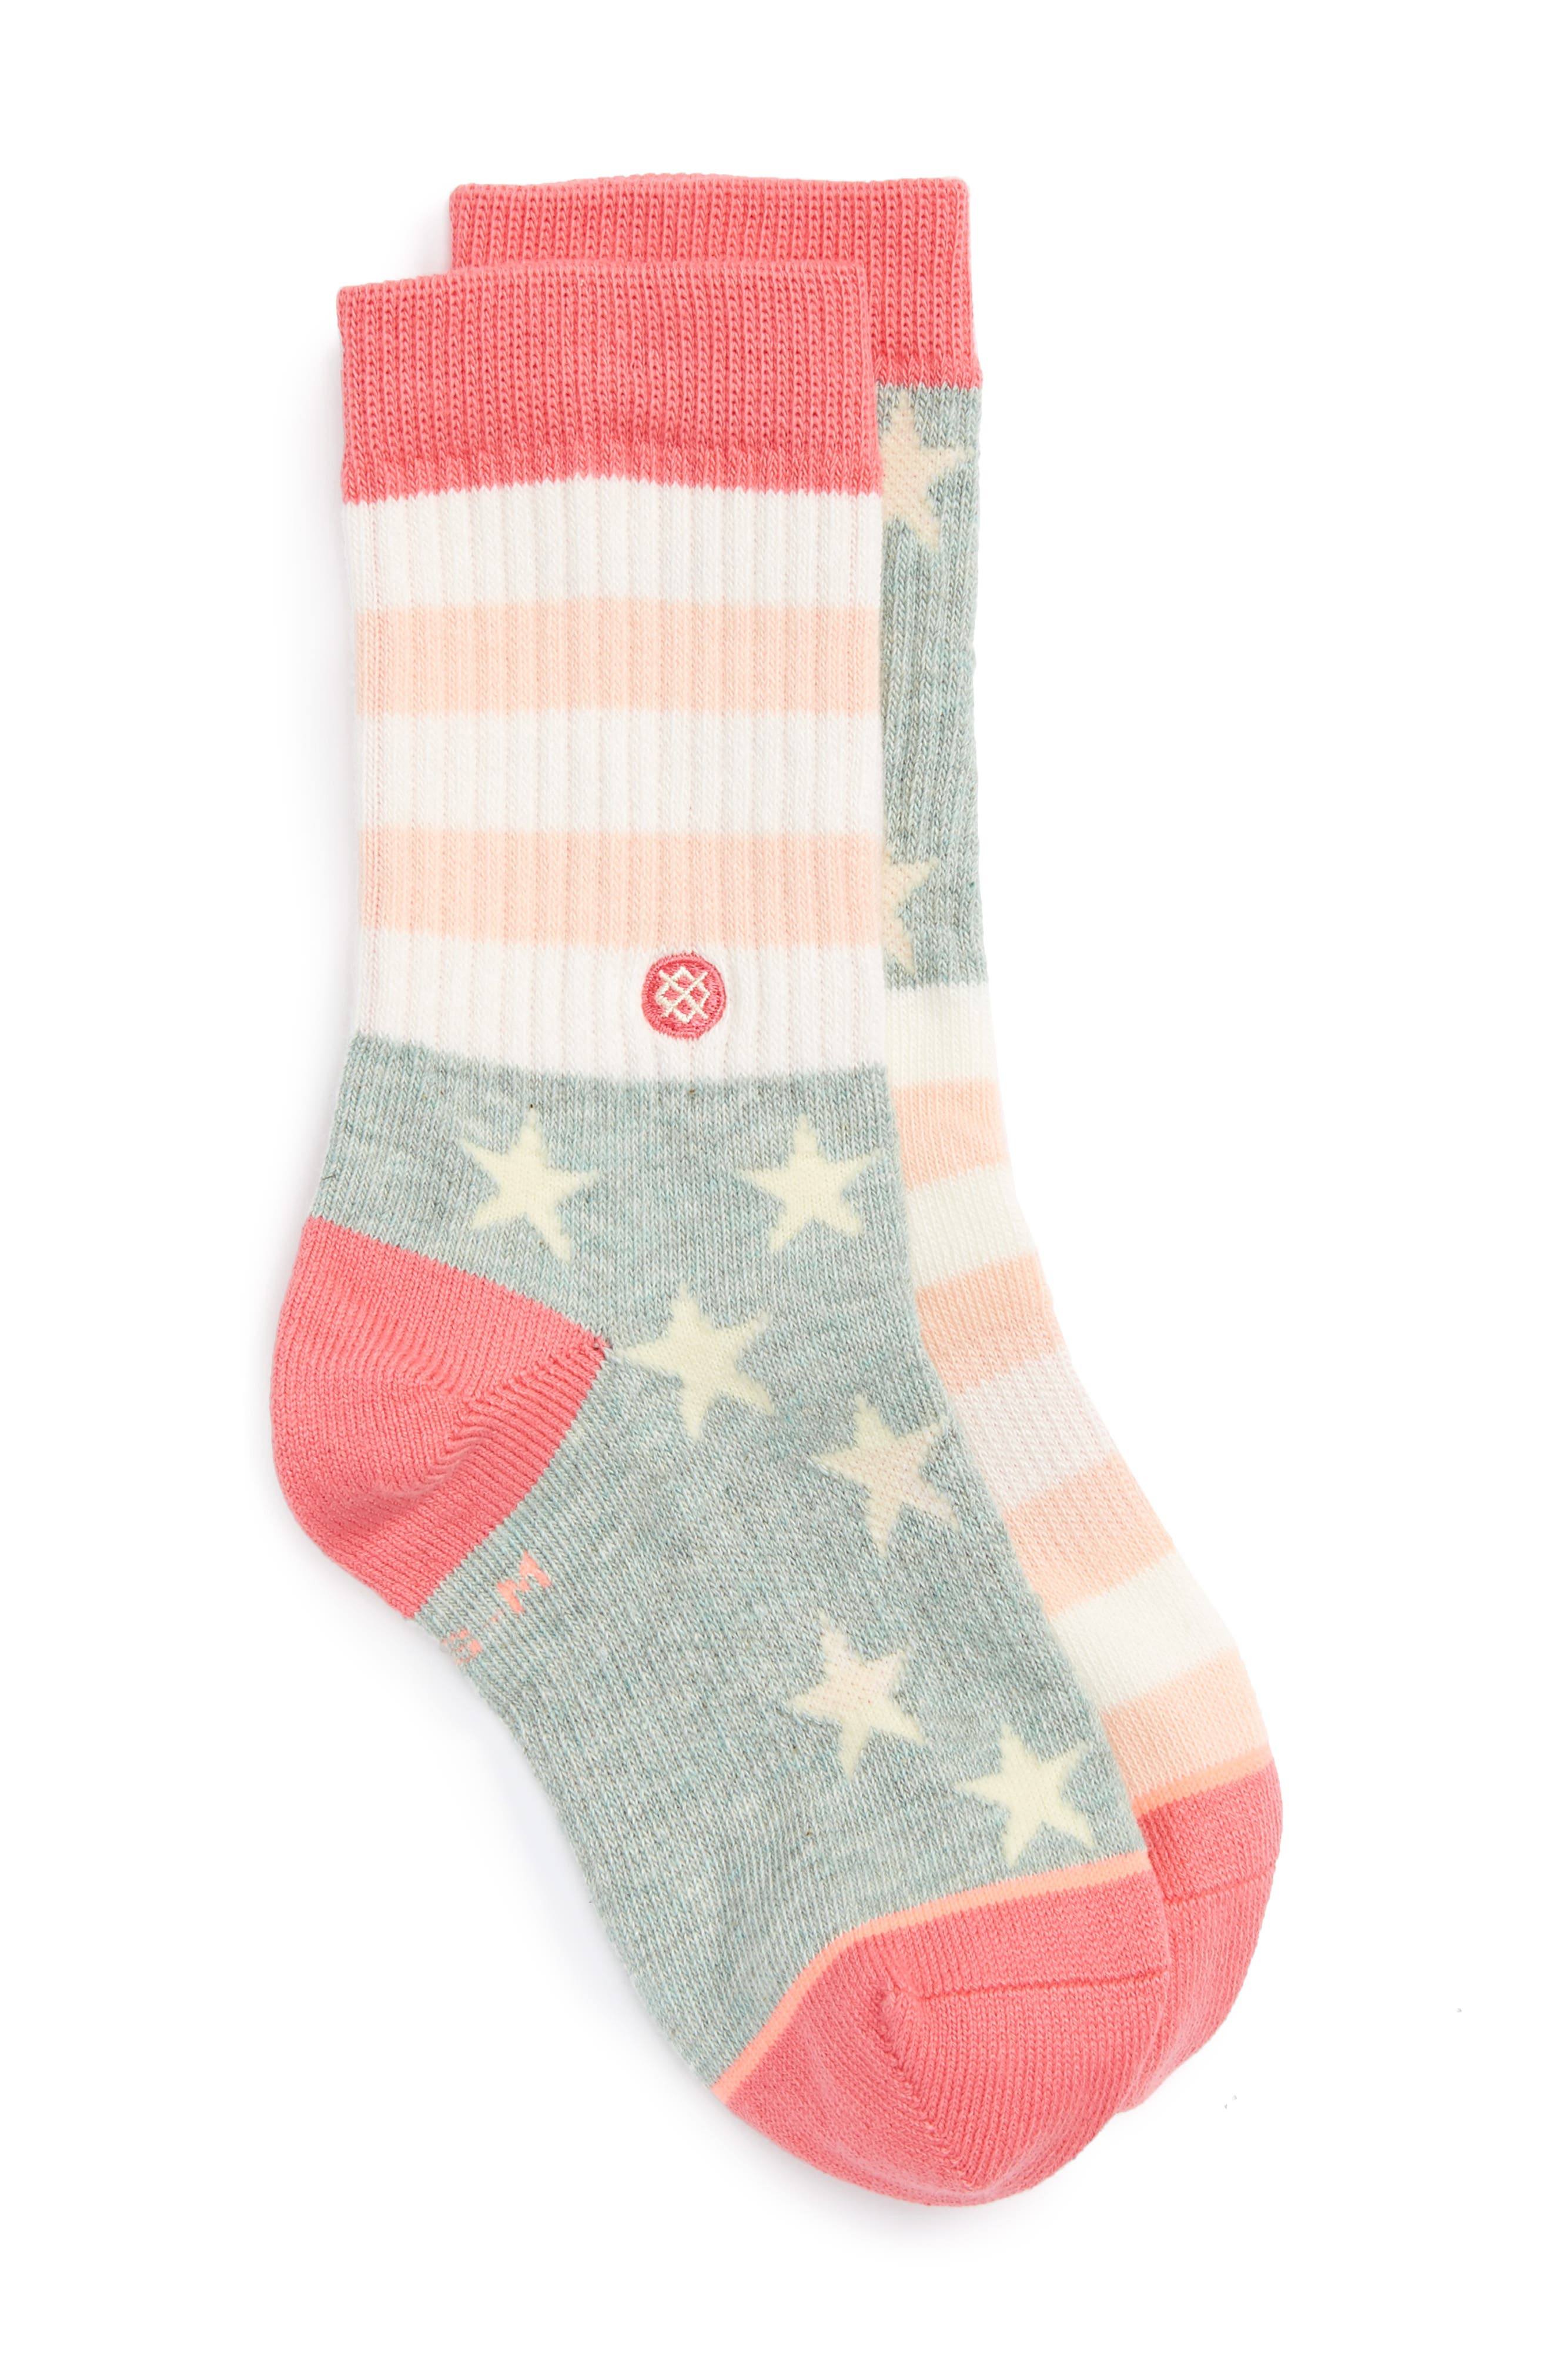 Liberty Socks,                             Main thumbnail 1, color,                             651